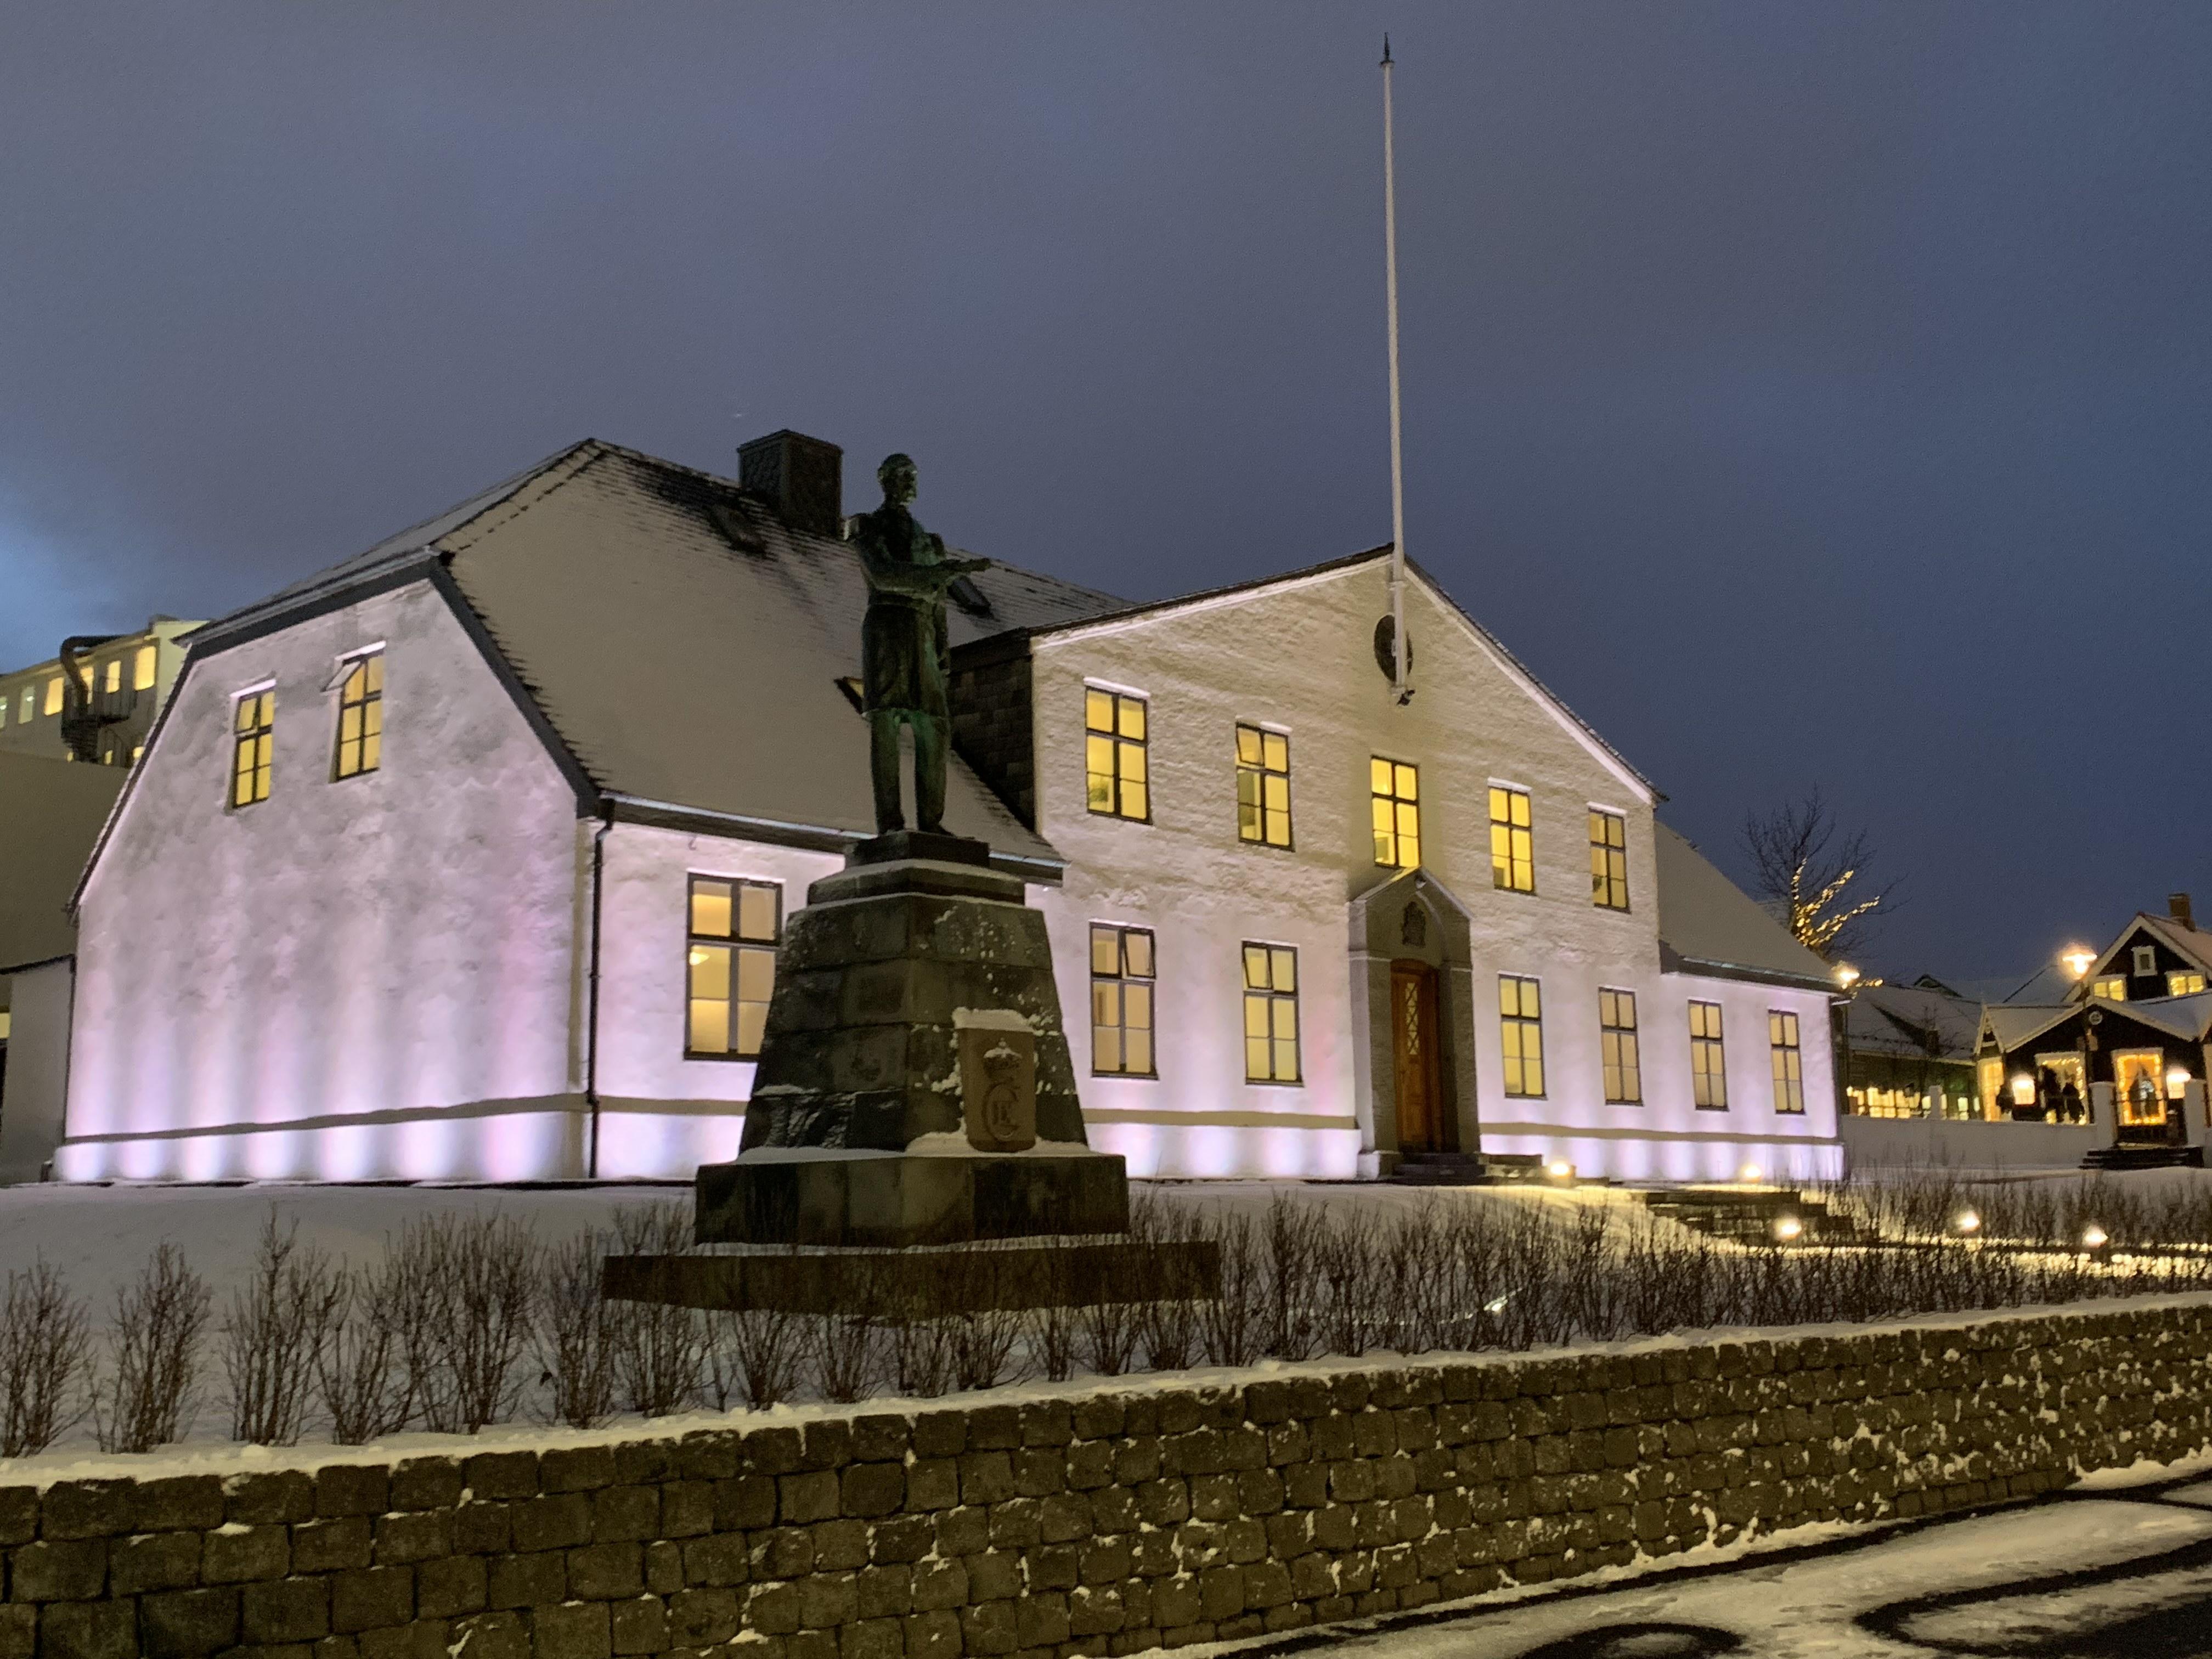 Reykjavík is the capital city of Iceland.